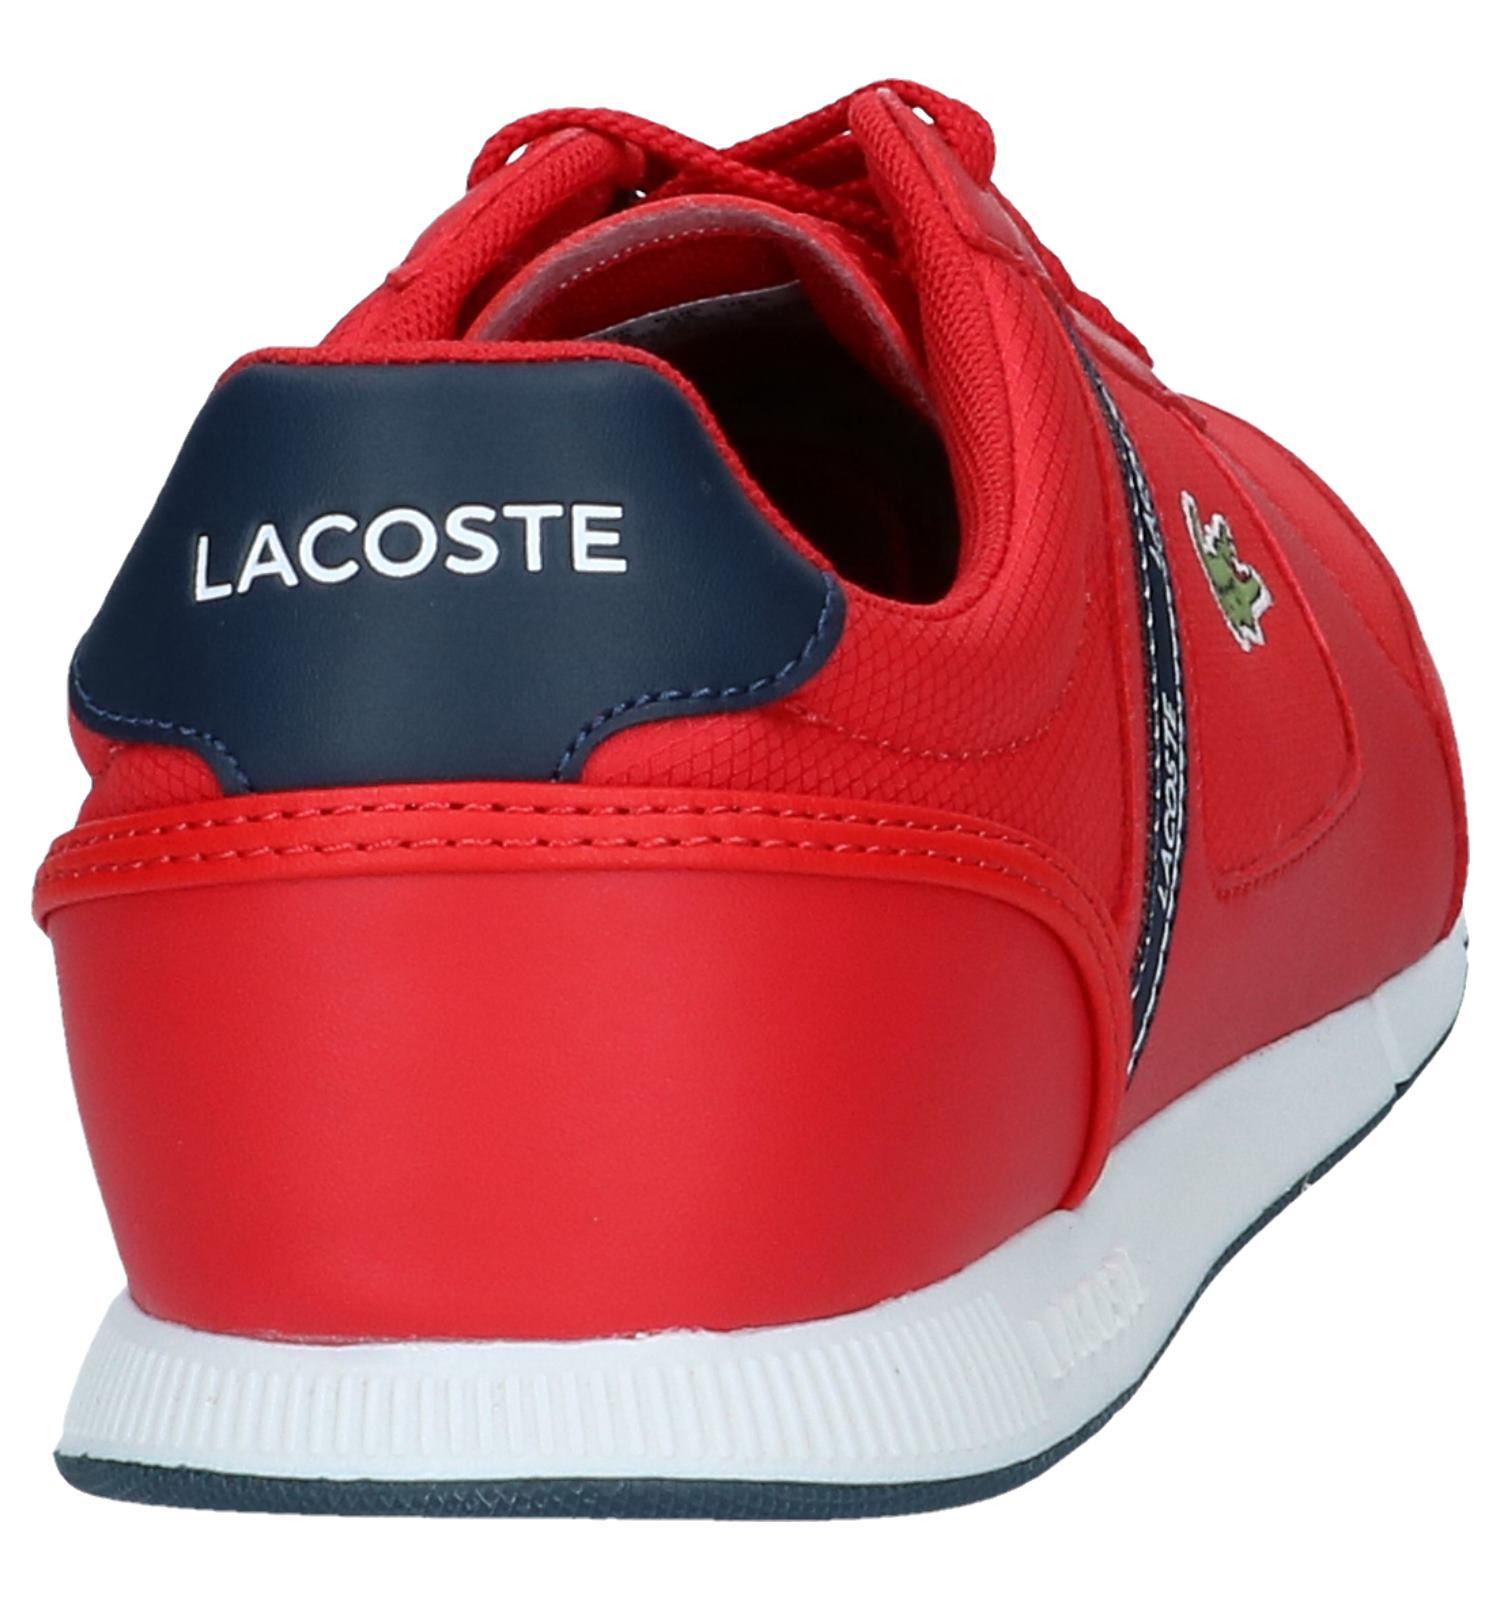 Lacoste Sneakers Lacoste Sneakers Rode Sneakers Menerva Sport Lacoste Menerva Sport Rode Rode tsQrdh